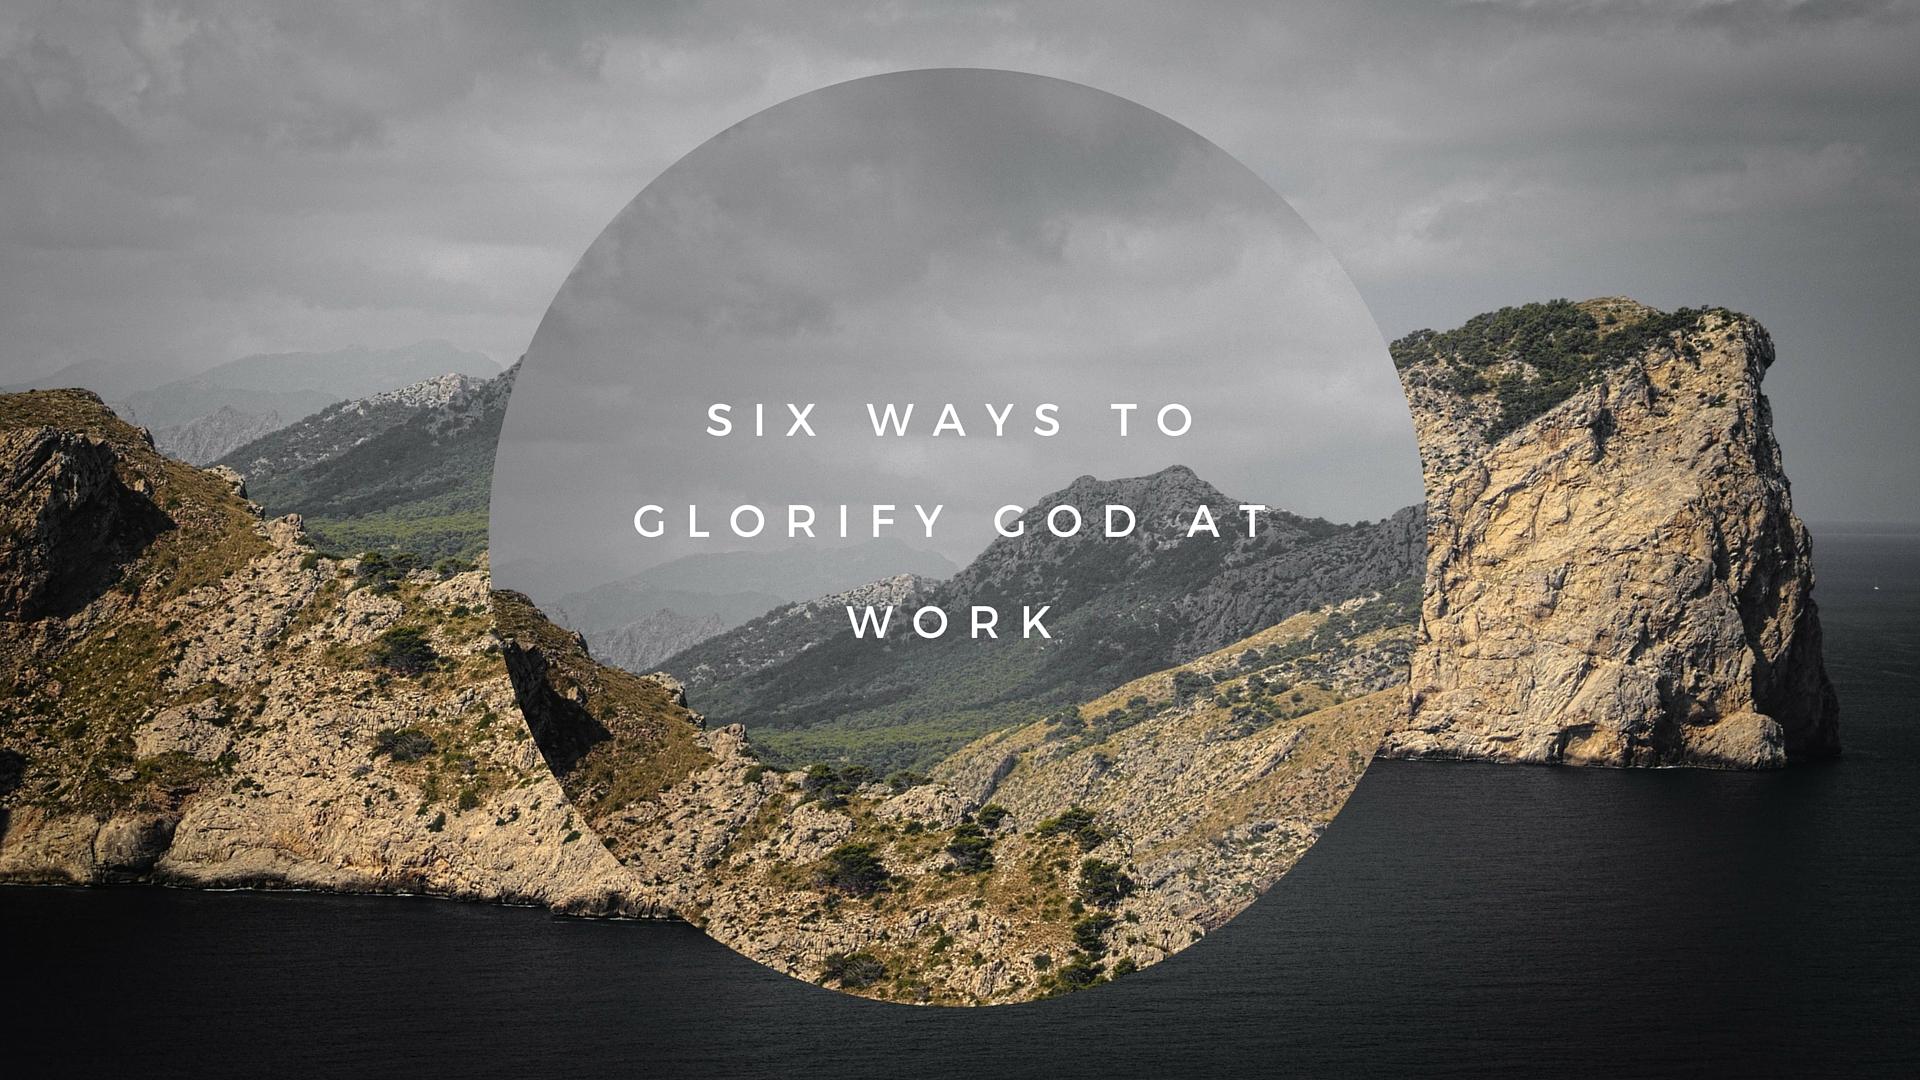 Six Ways to Glorify God at Work